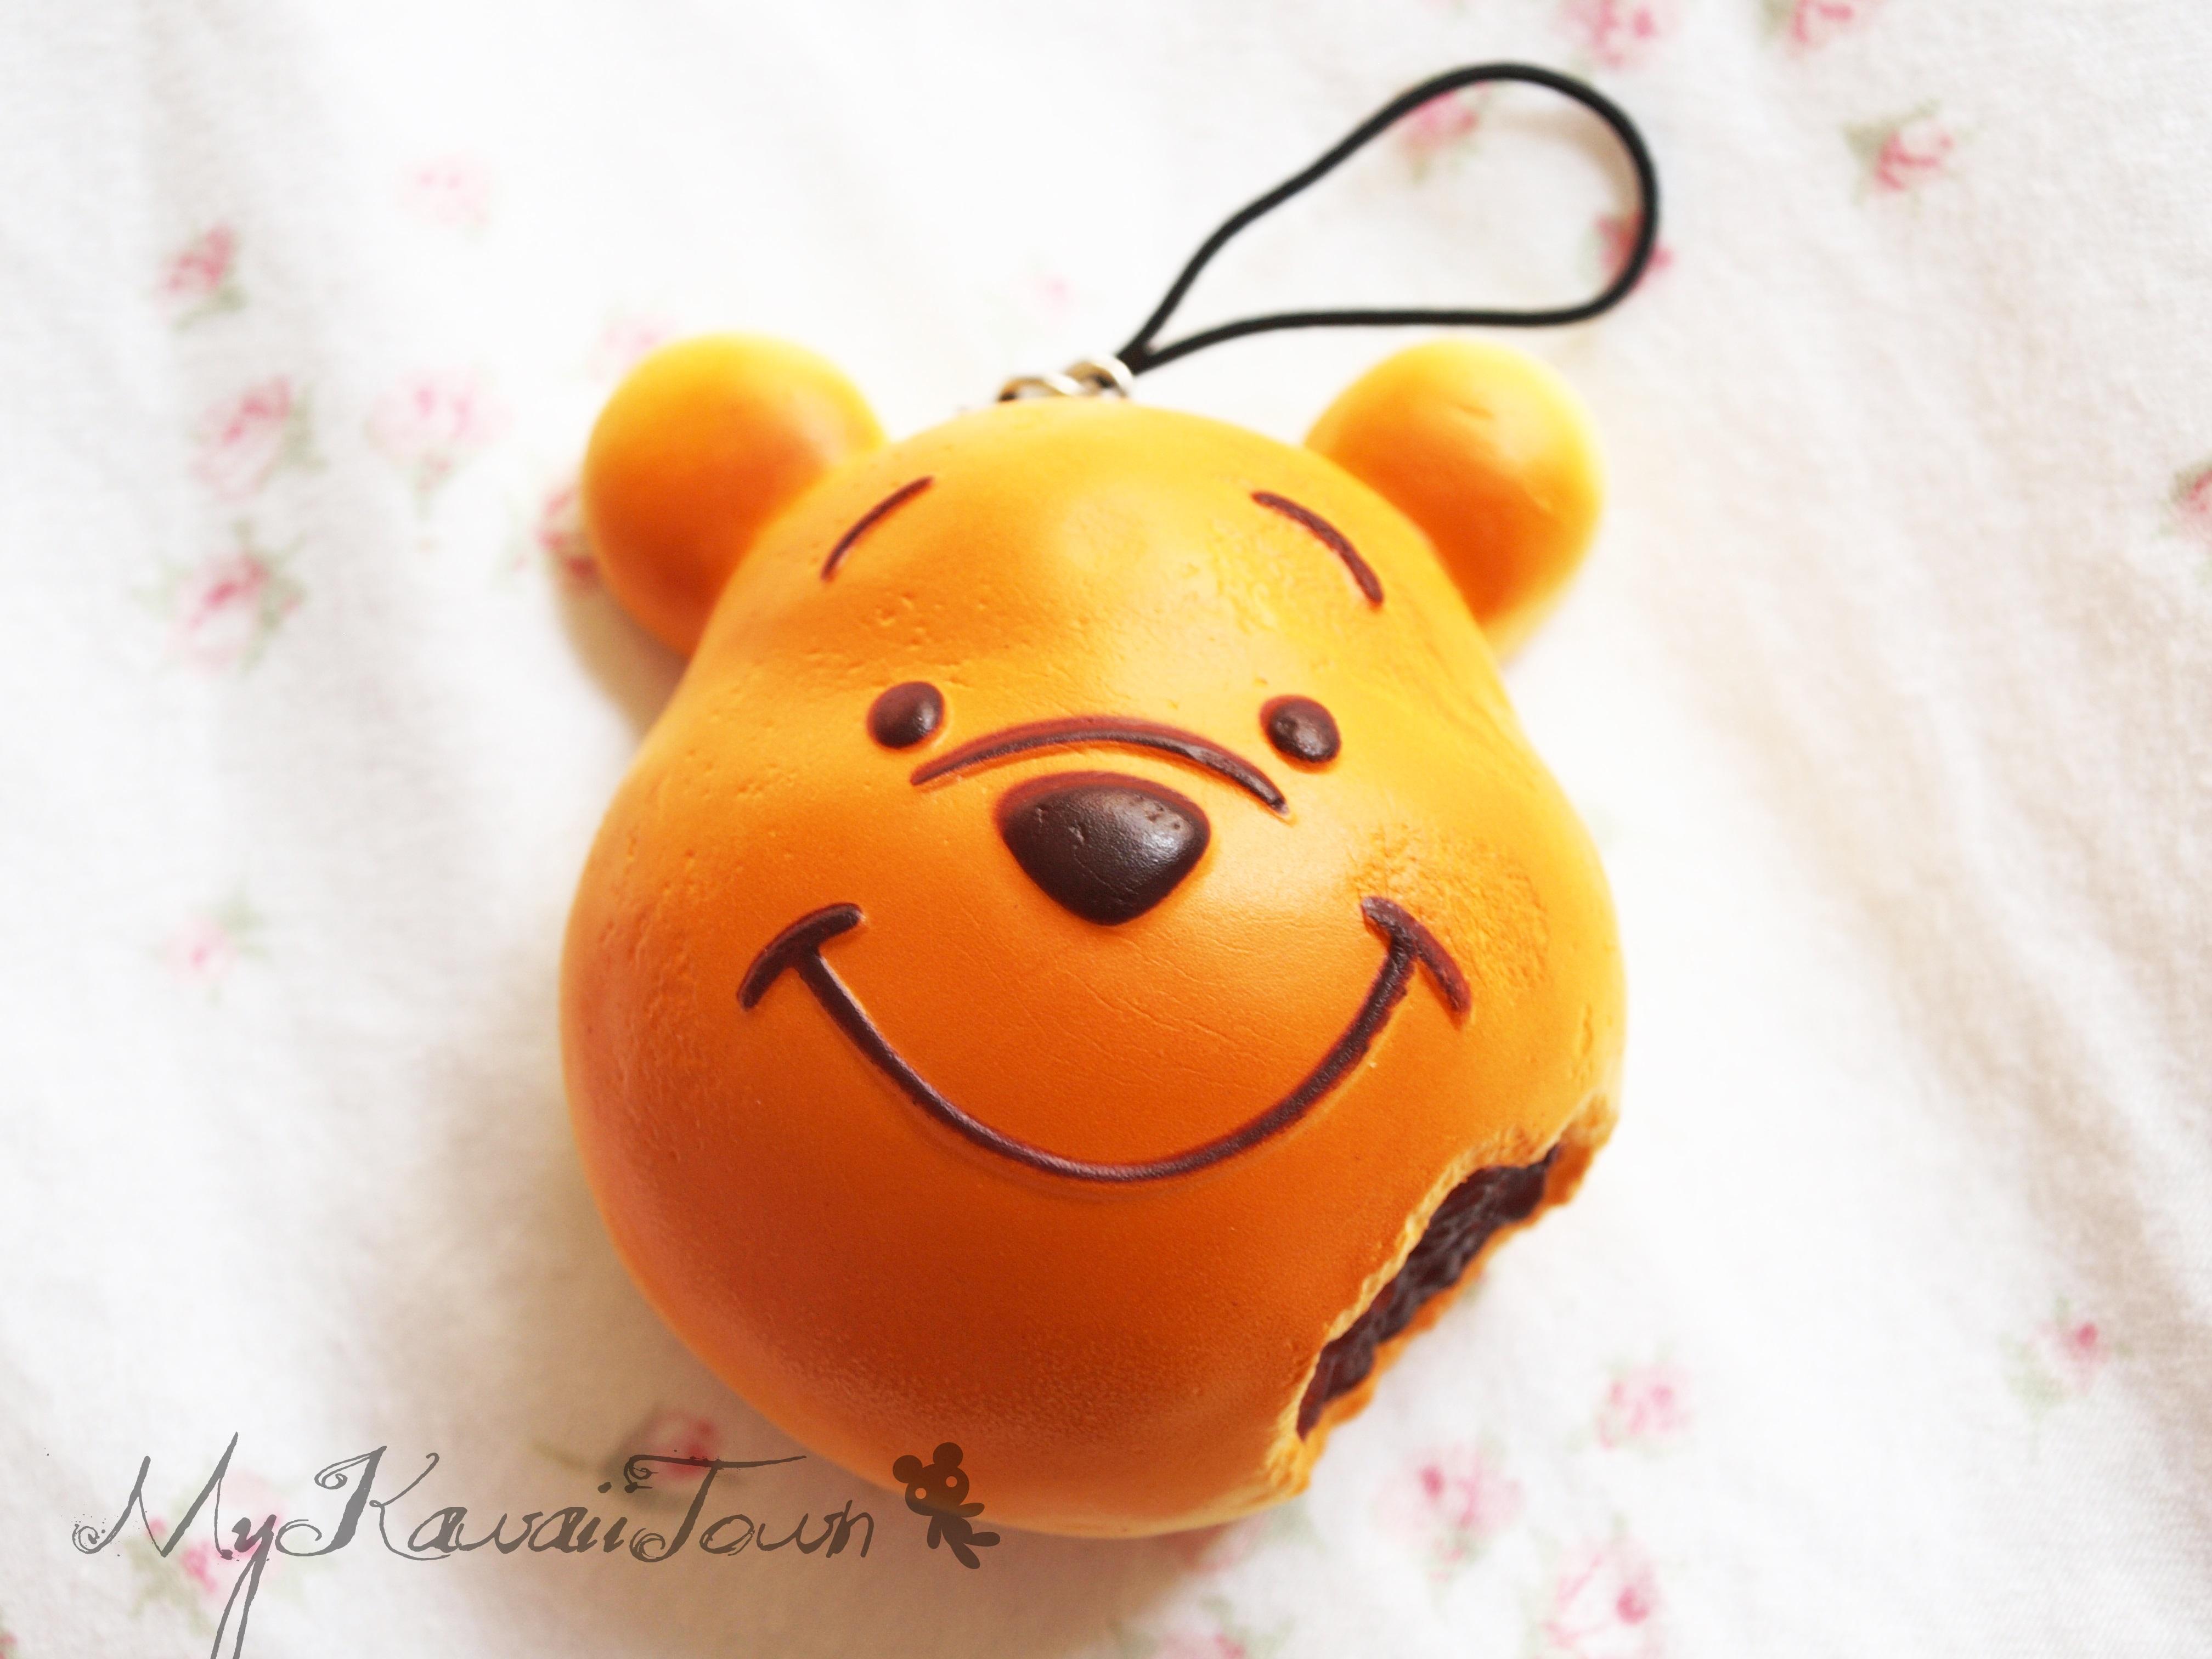 My Squishy Bun Collection : Mykawaiitown Squishy Winnie The Pooh Bean Bun Online Store Powered by Storenvy